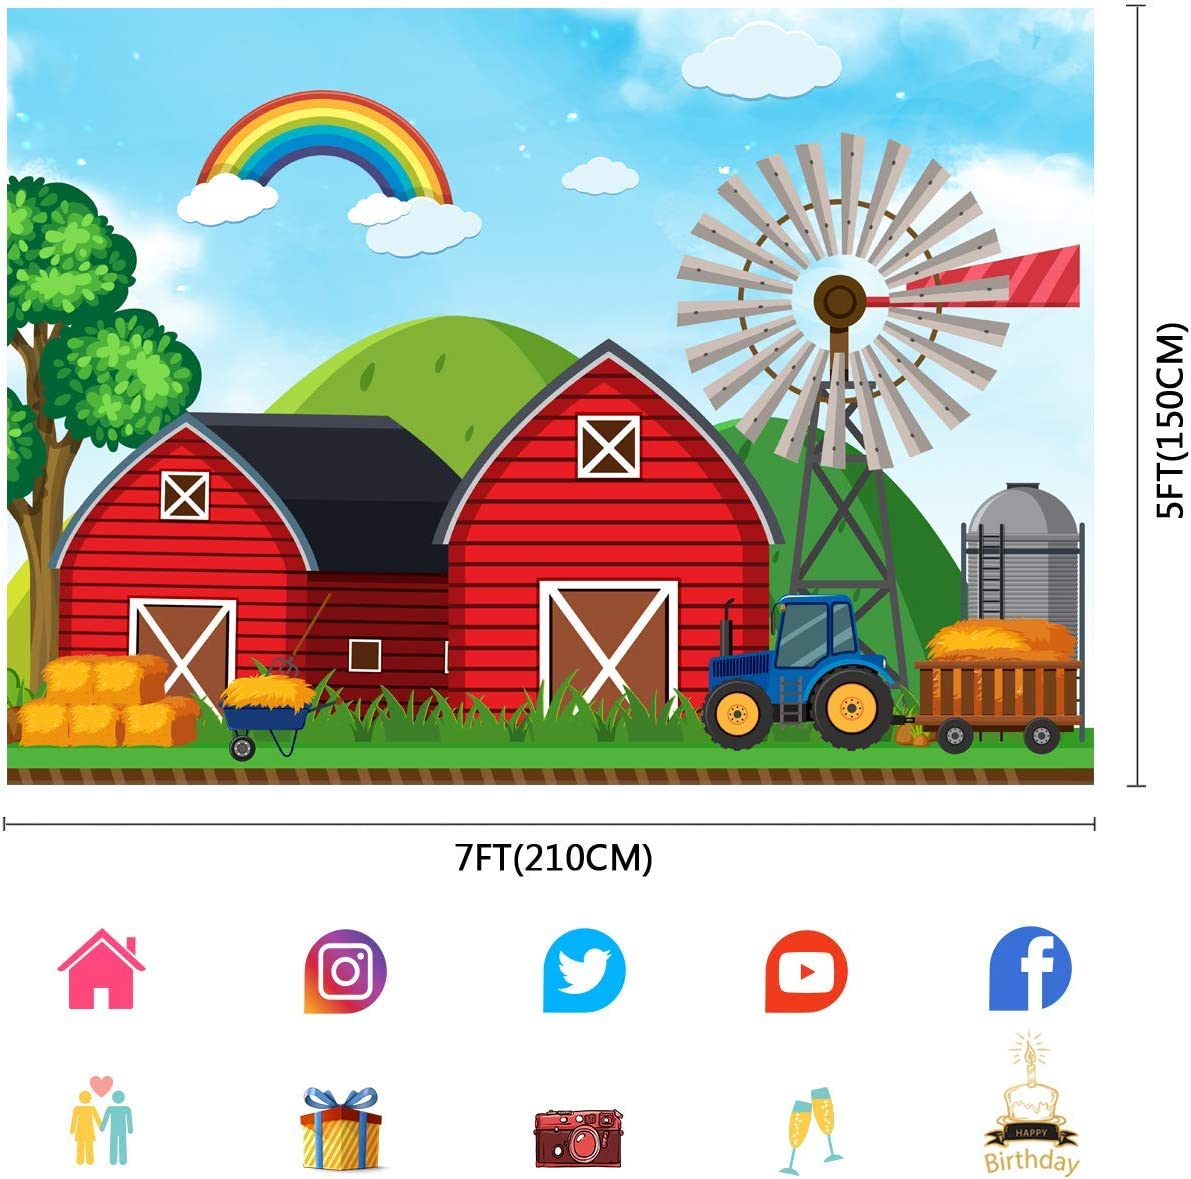 10x8ft Barn Farm Backdrop Cartoon Rainbow Countryside Scene Photography Background Birthday Party Photo Studio Props LLFU042